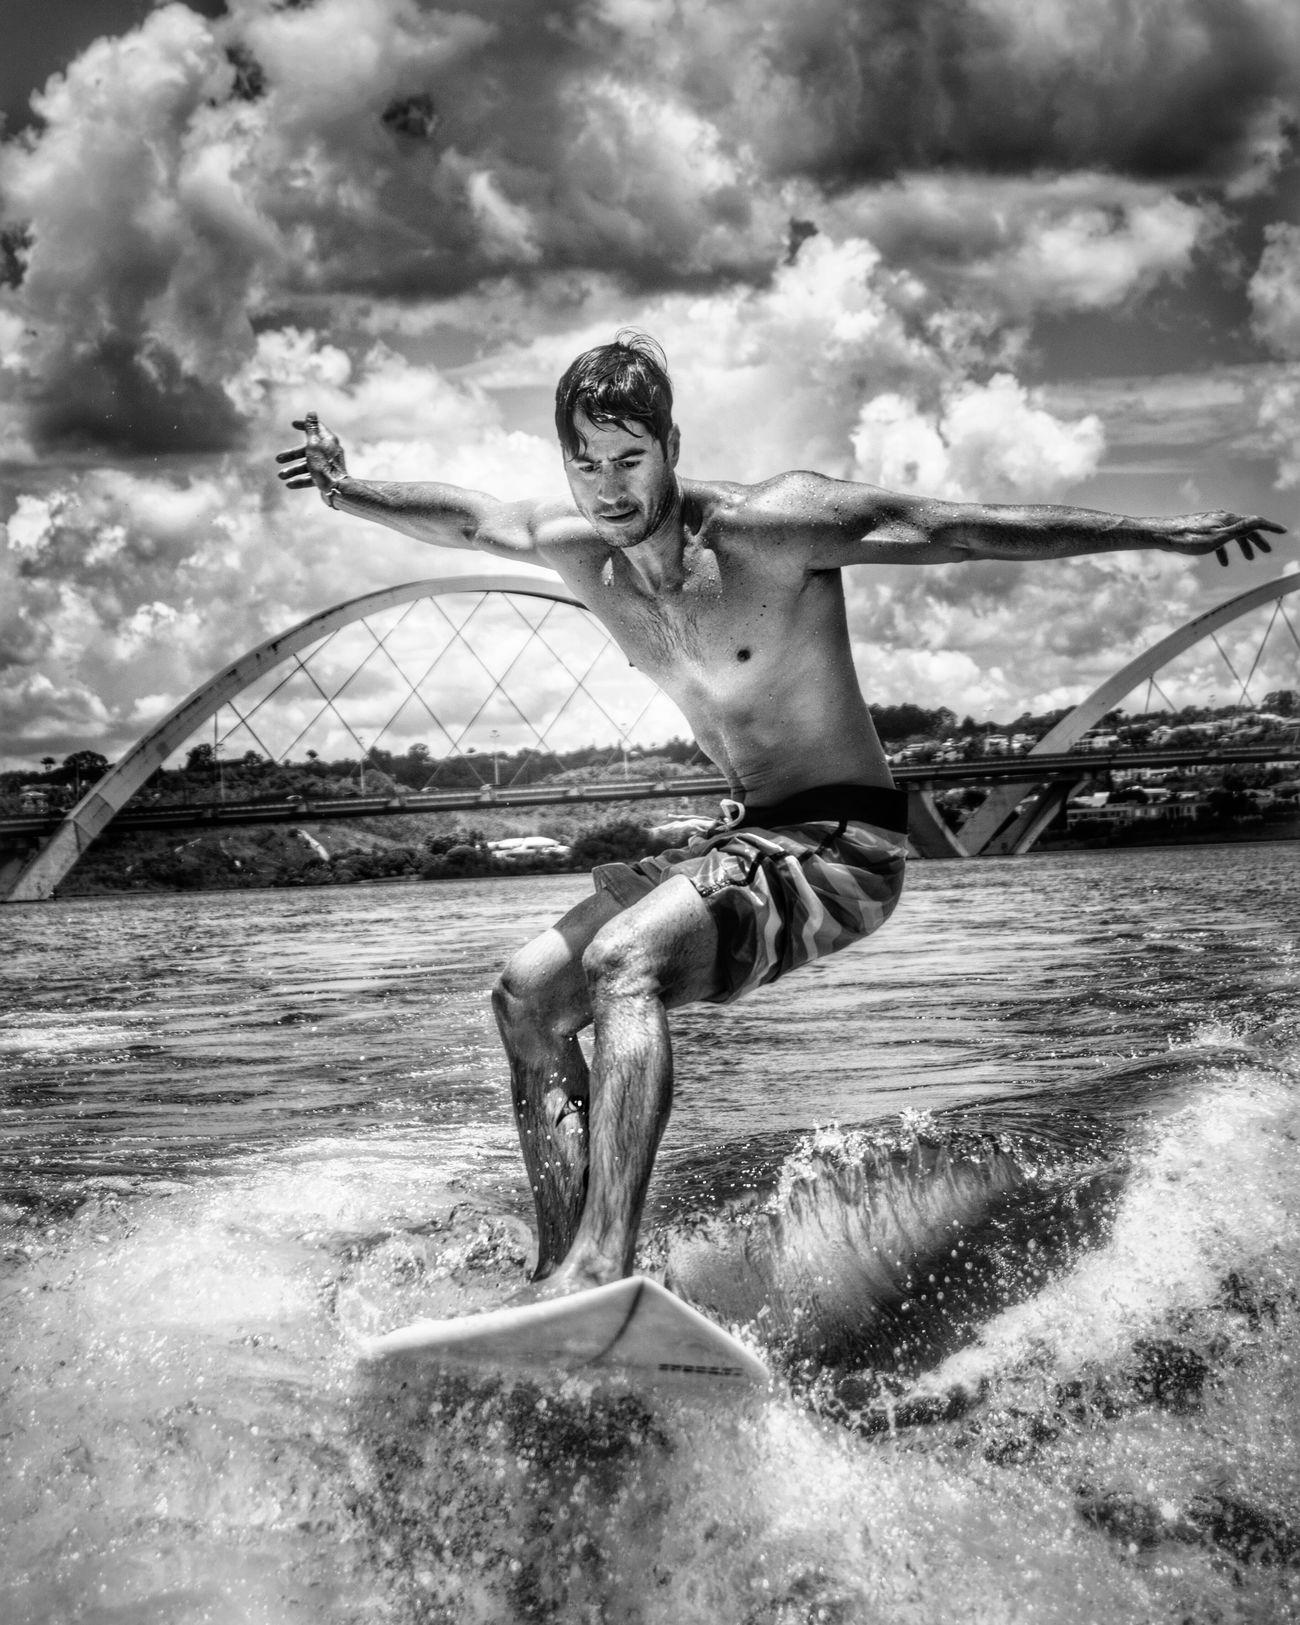 Cloud - Sky Water Cloudscape Outdoors Leisure Activity Sport One Person Sky Brasília Brazil Lago Paranoa Wakesurf Wakesurfing Surf Surfing Wakeboard Wakeboarding Wakeboarding Life  Day Black & White Black And White Black&white Photography Blackandwhite Photography Blackandwhite